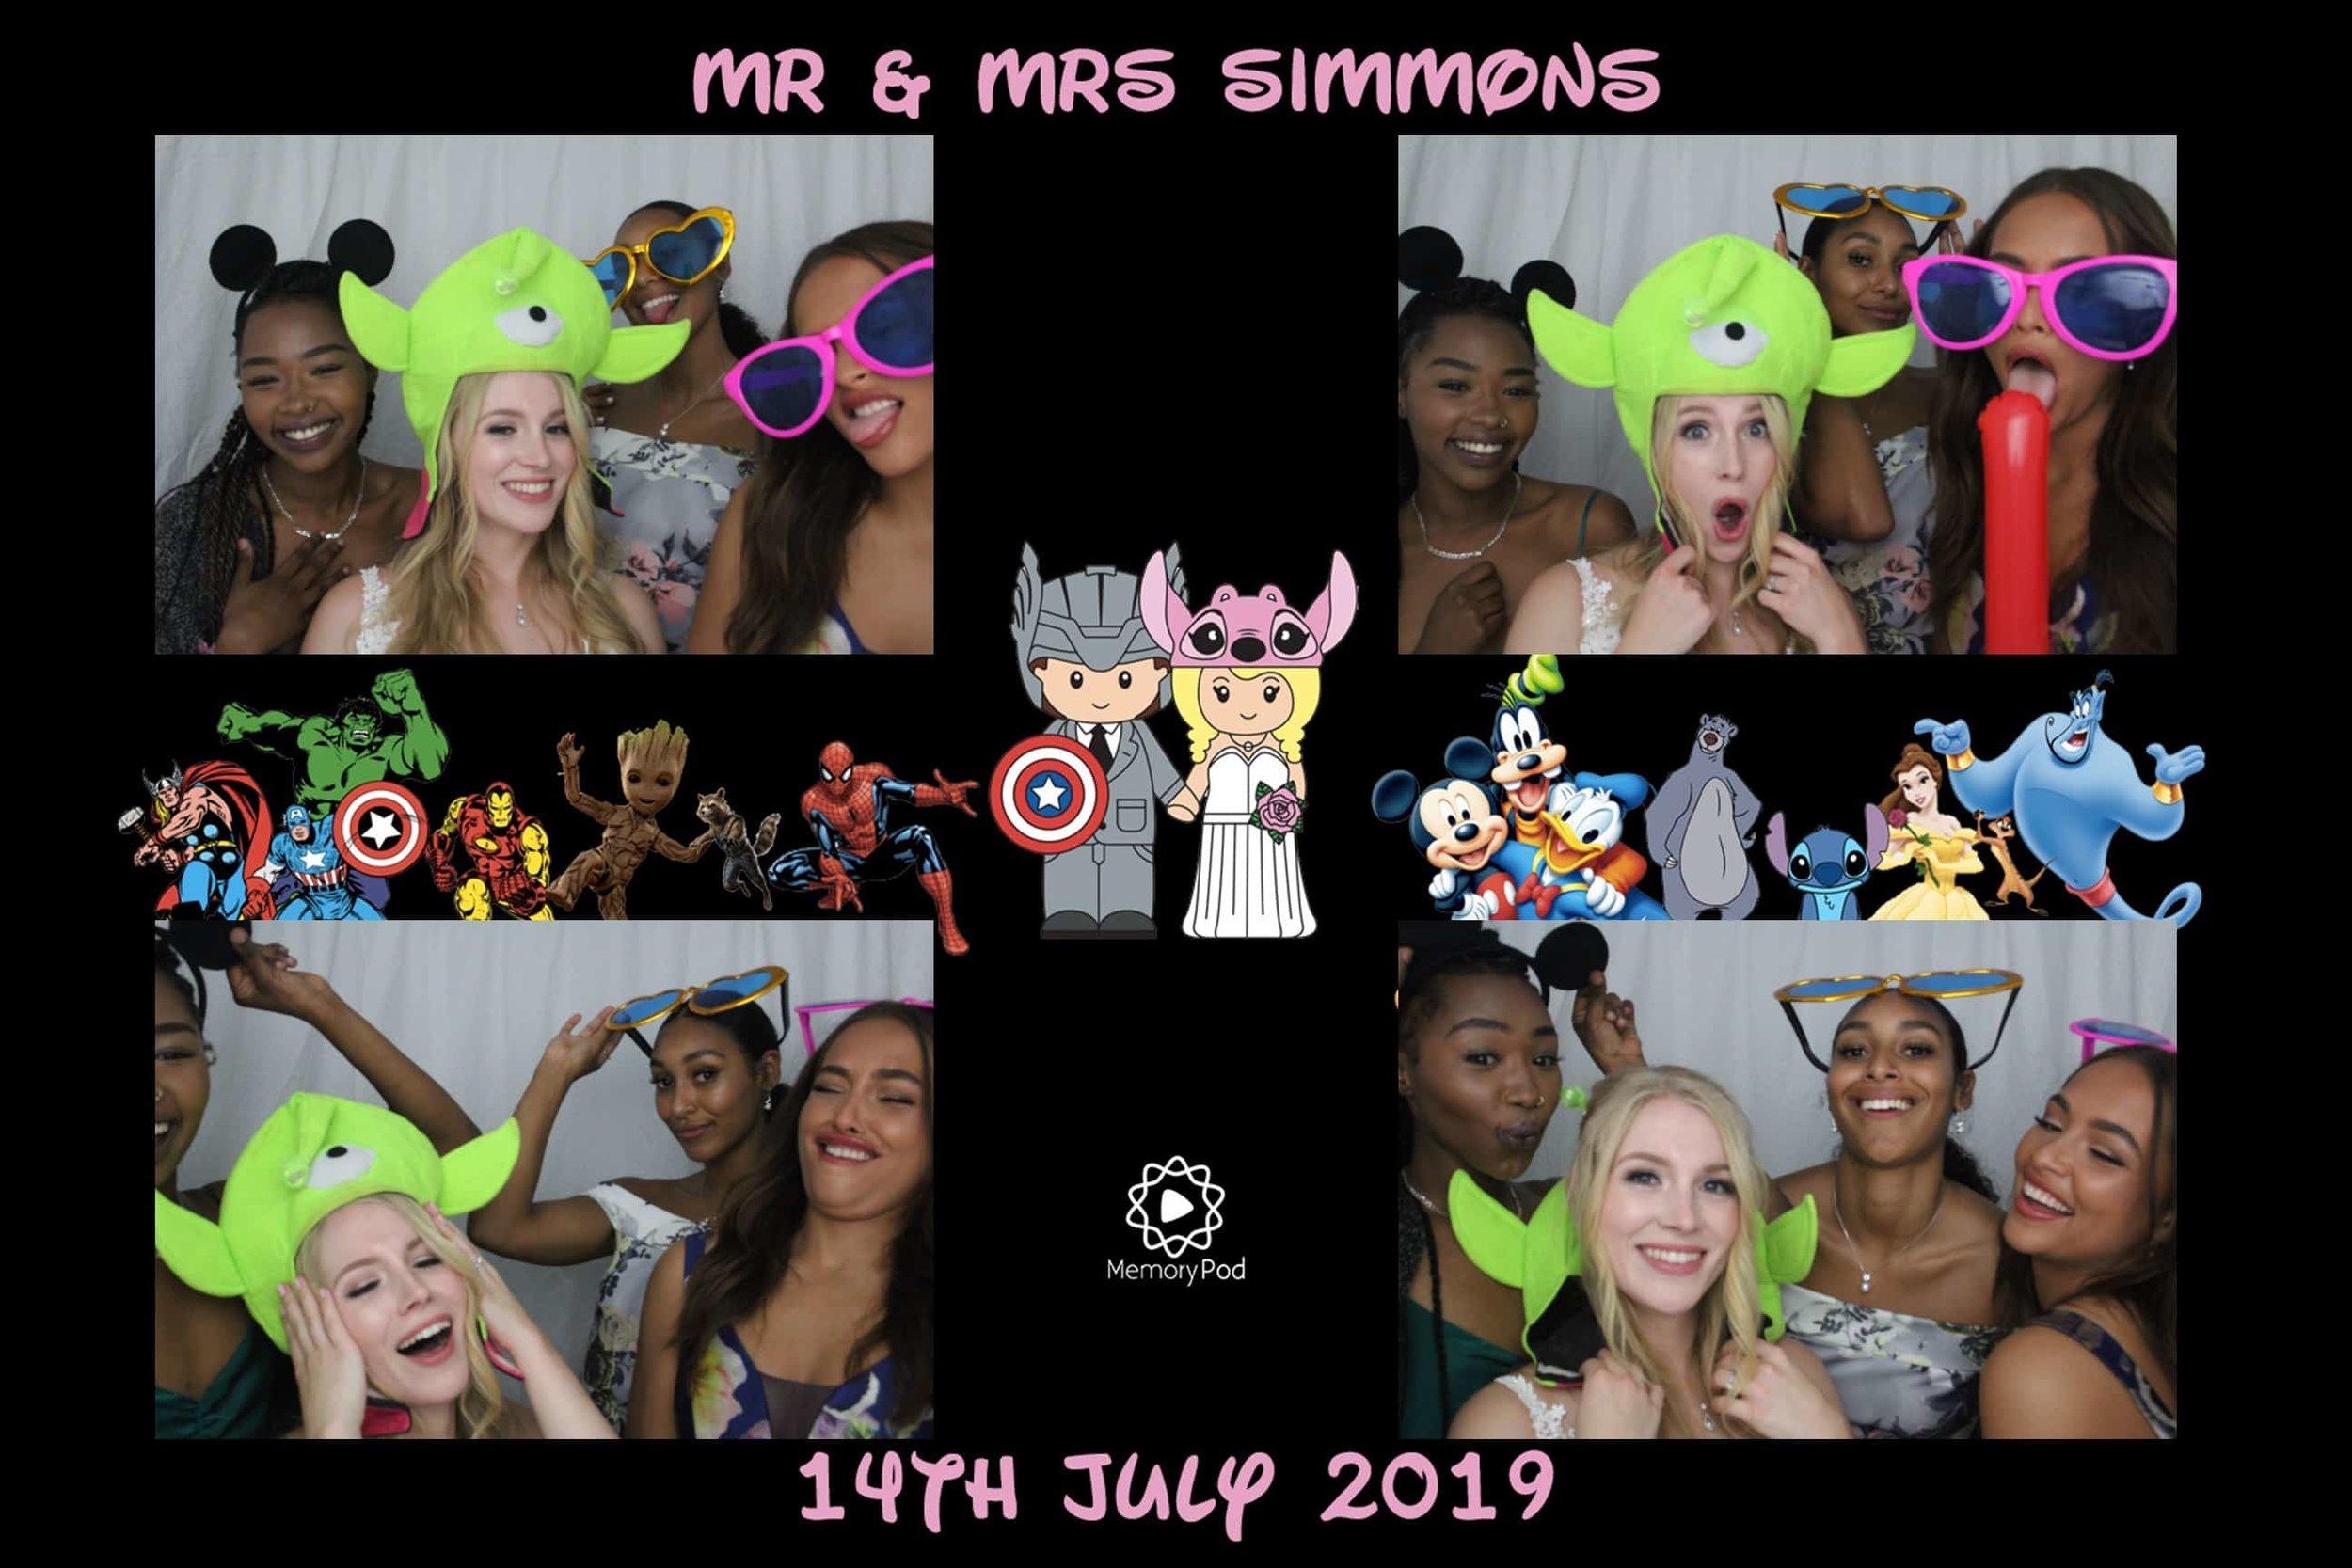 Mr & Mrs Simmons Wedding.jpg